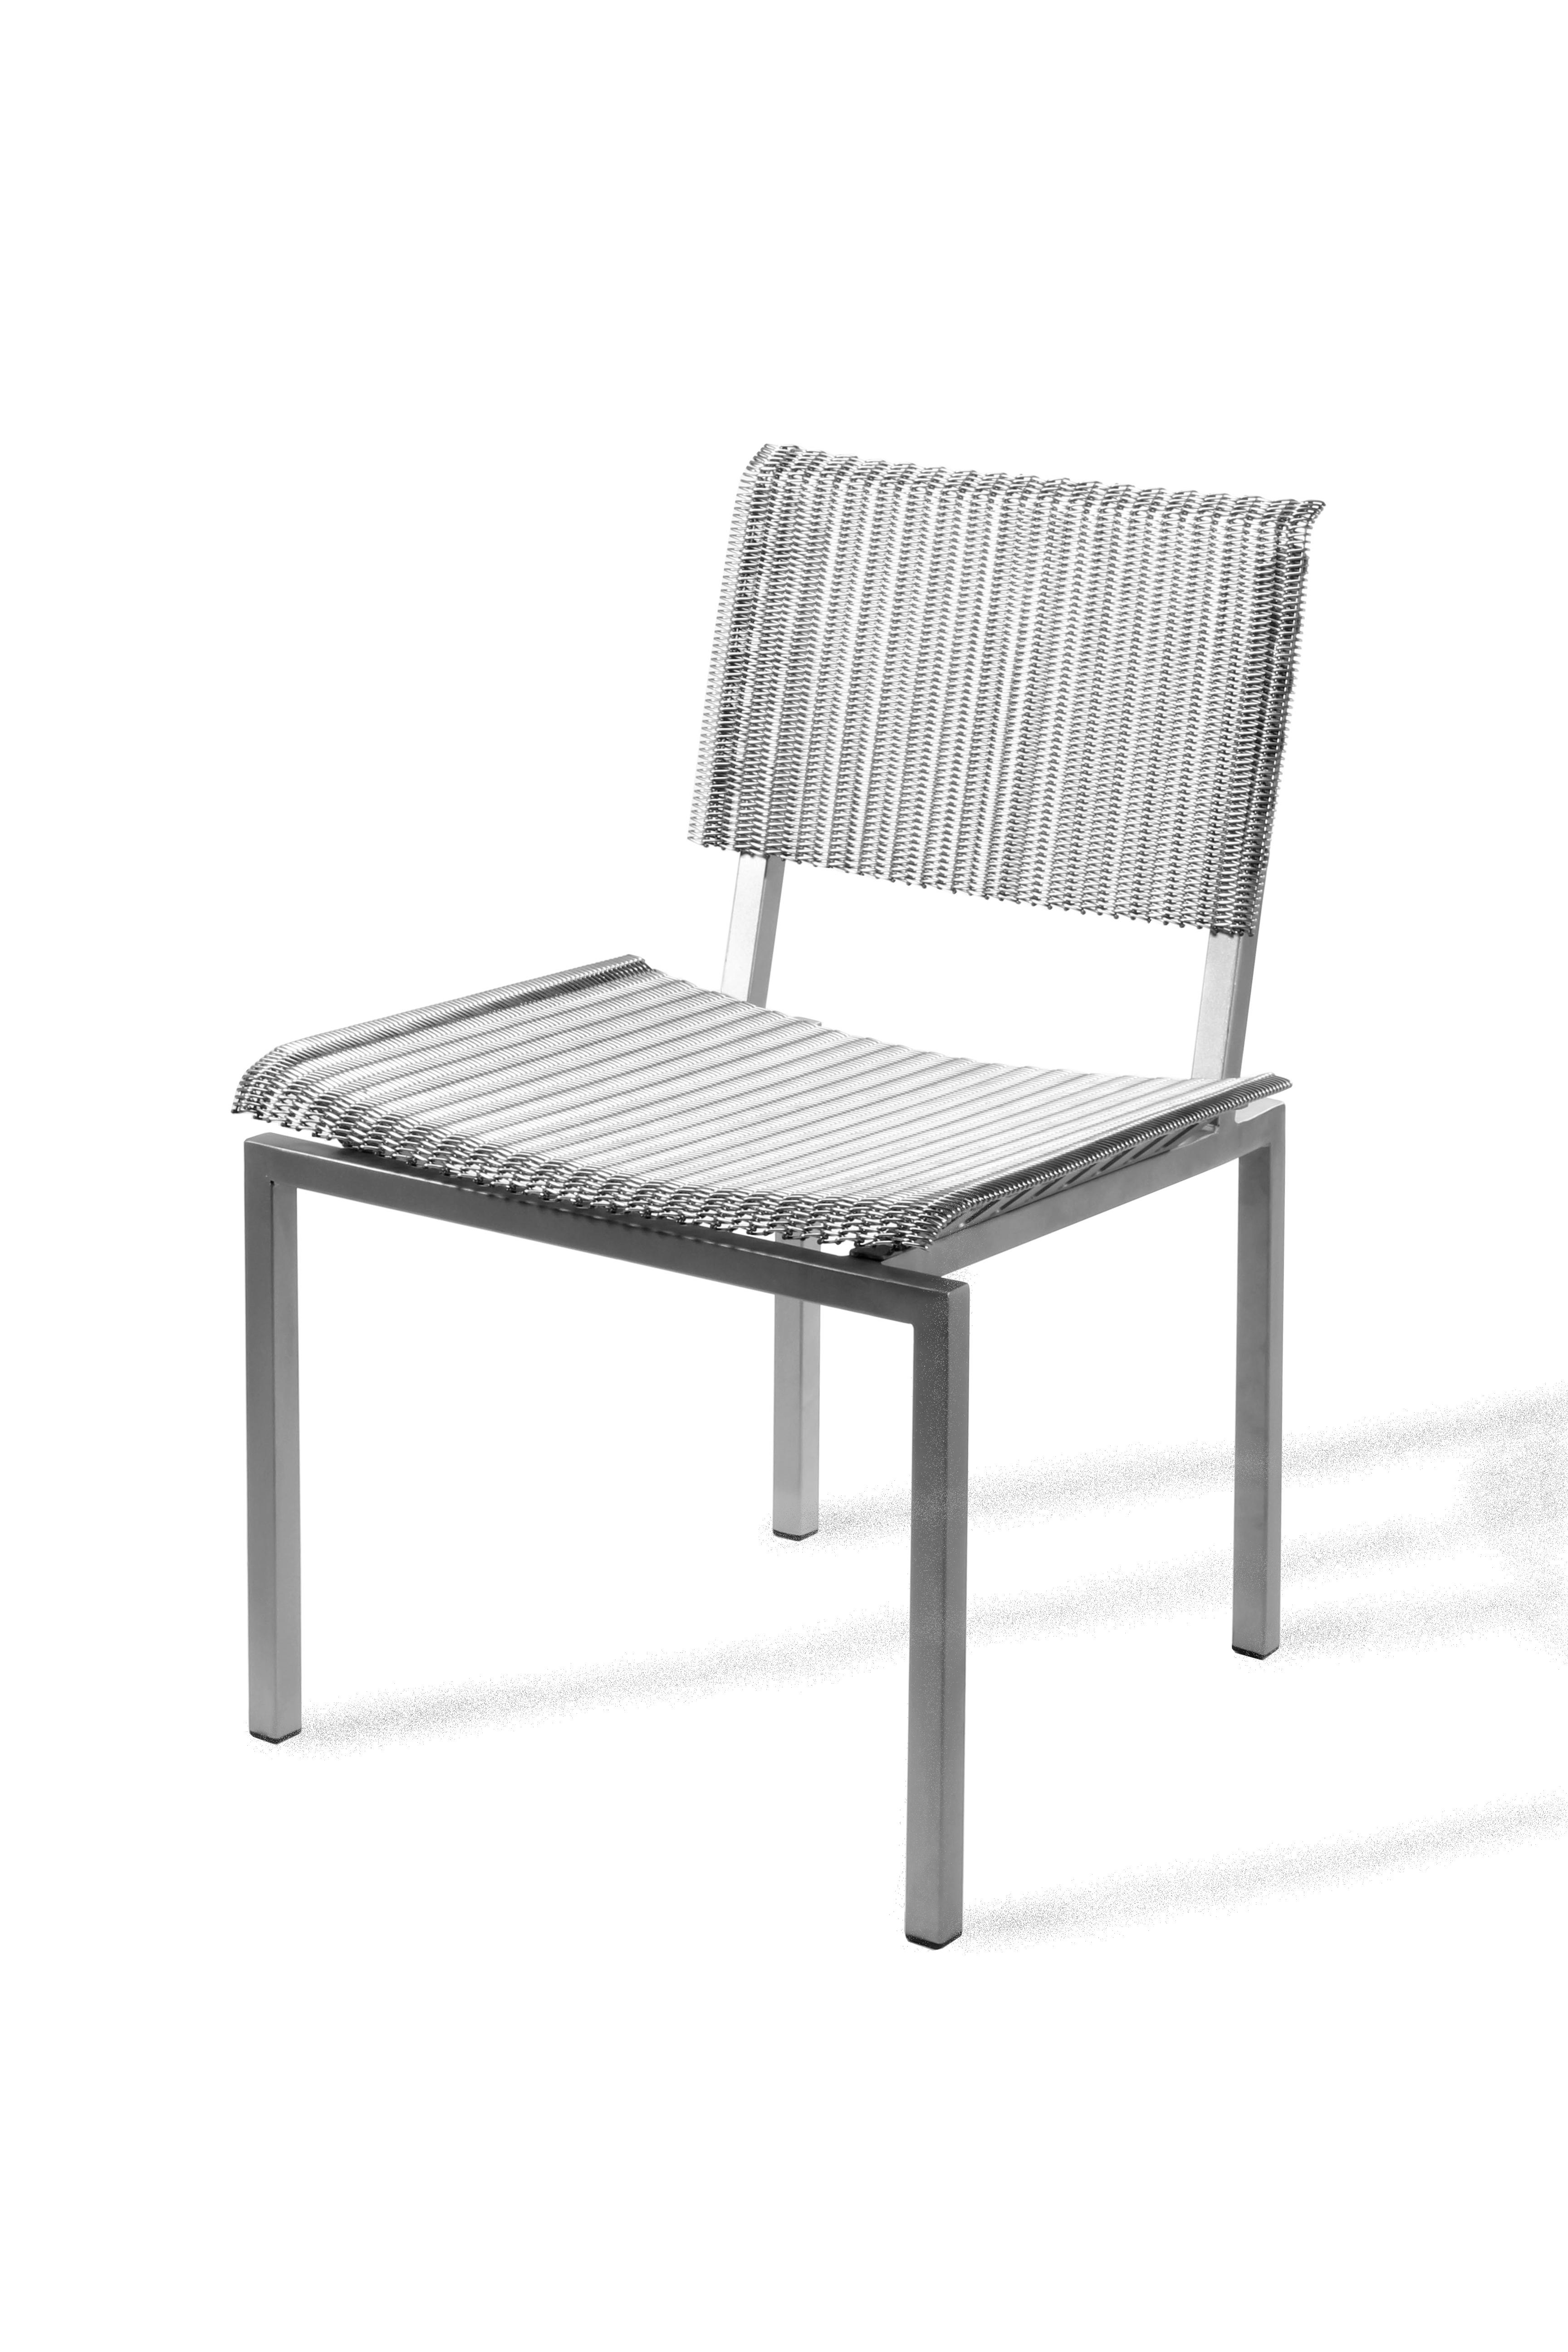 Danko Alchemy Woven Mesh Wire Chair